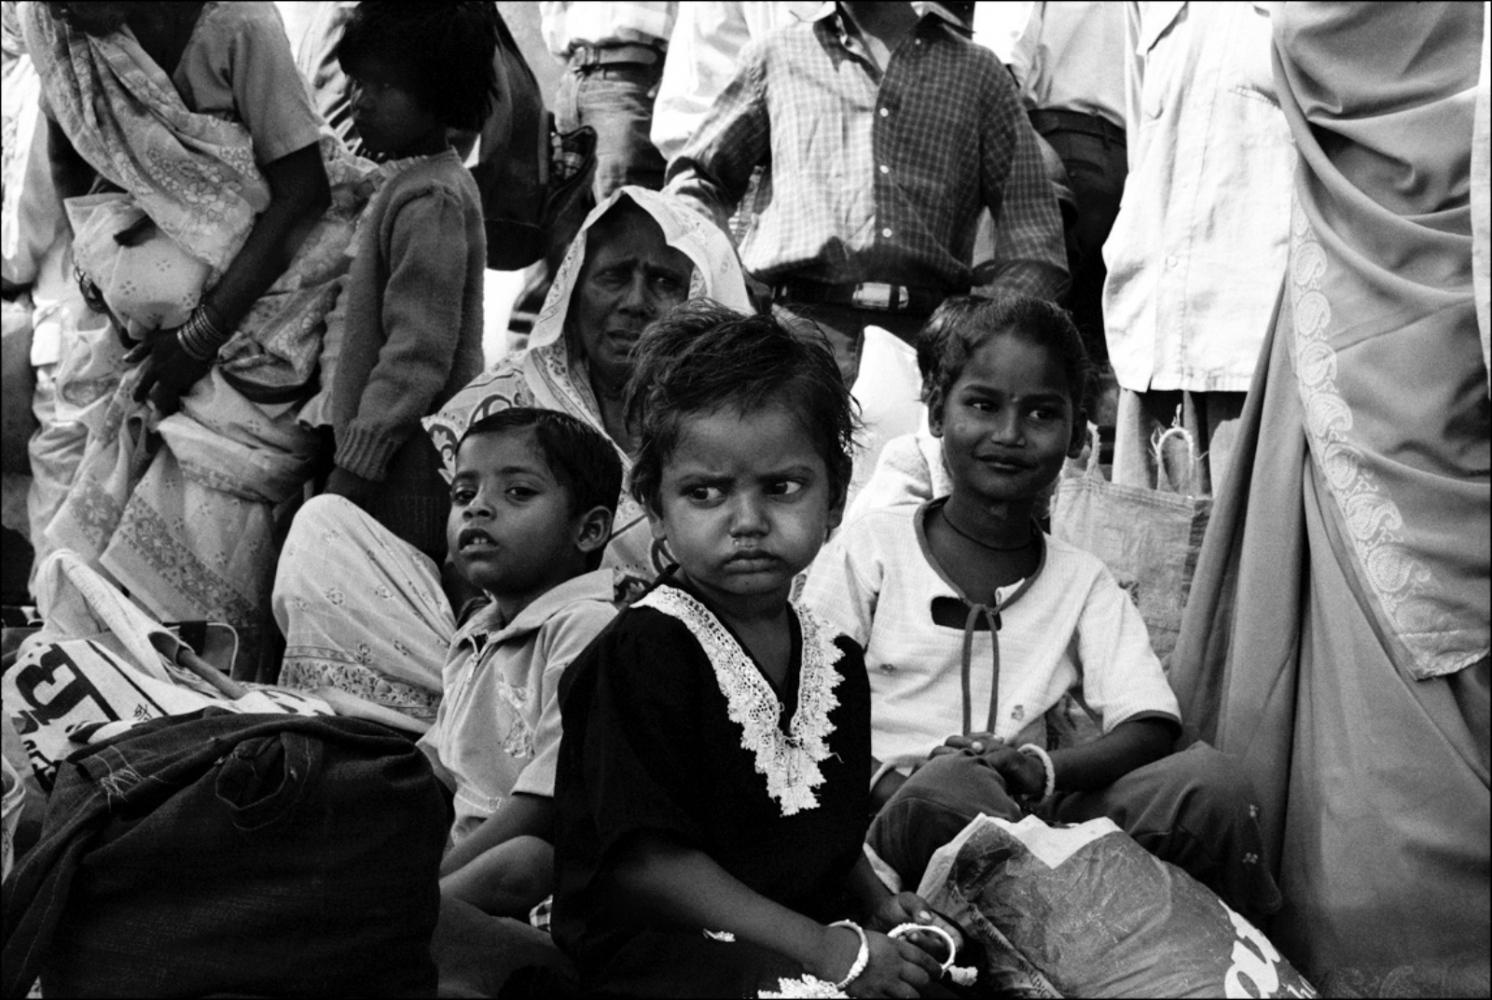 Sulking Child, Varanasi, India, November 2003